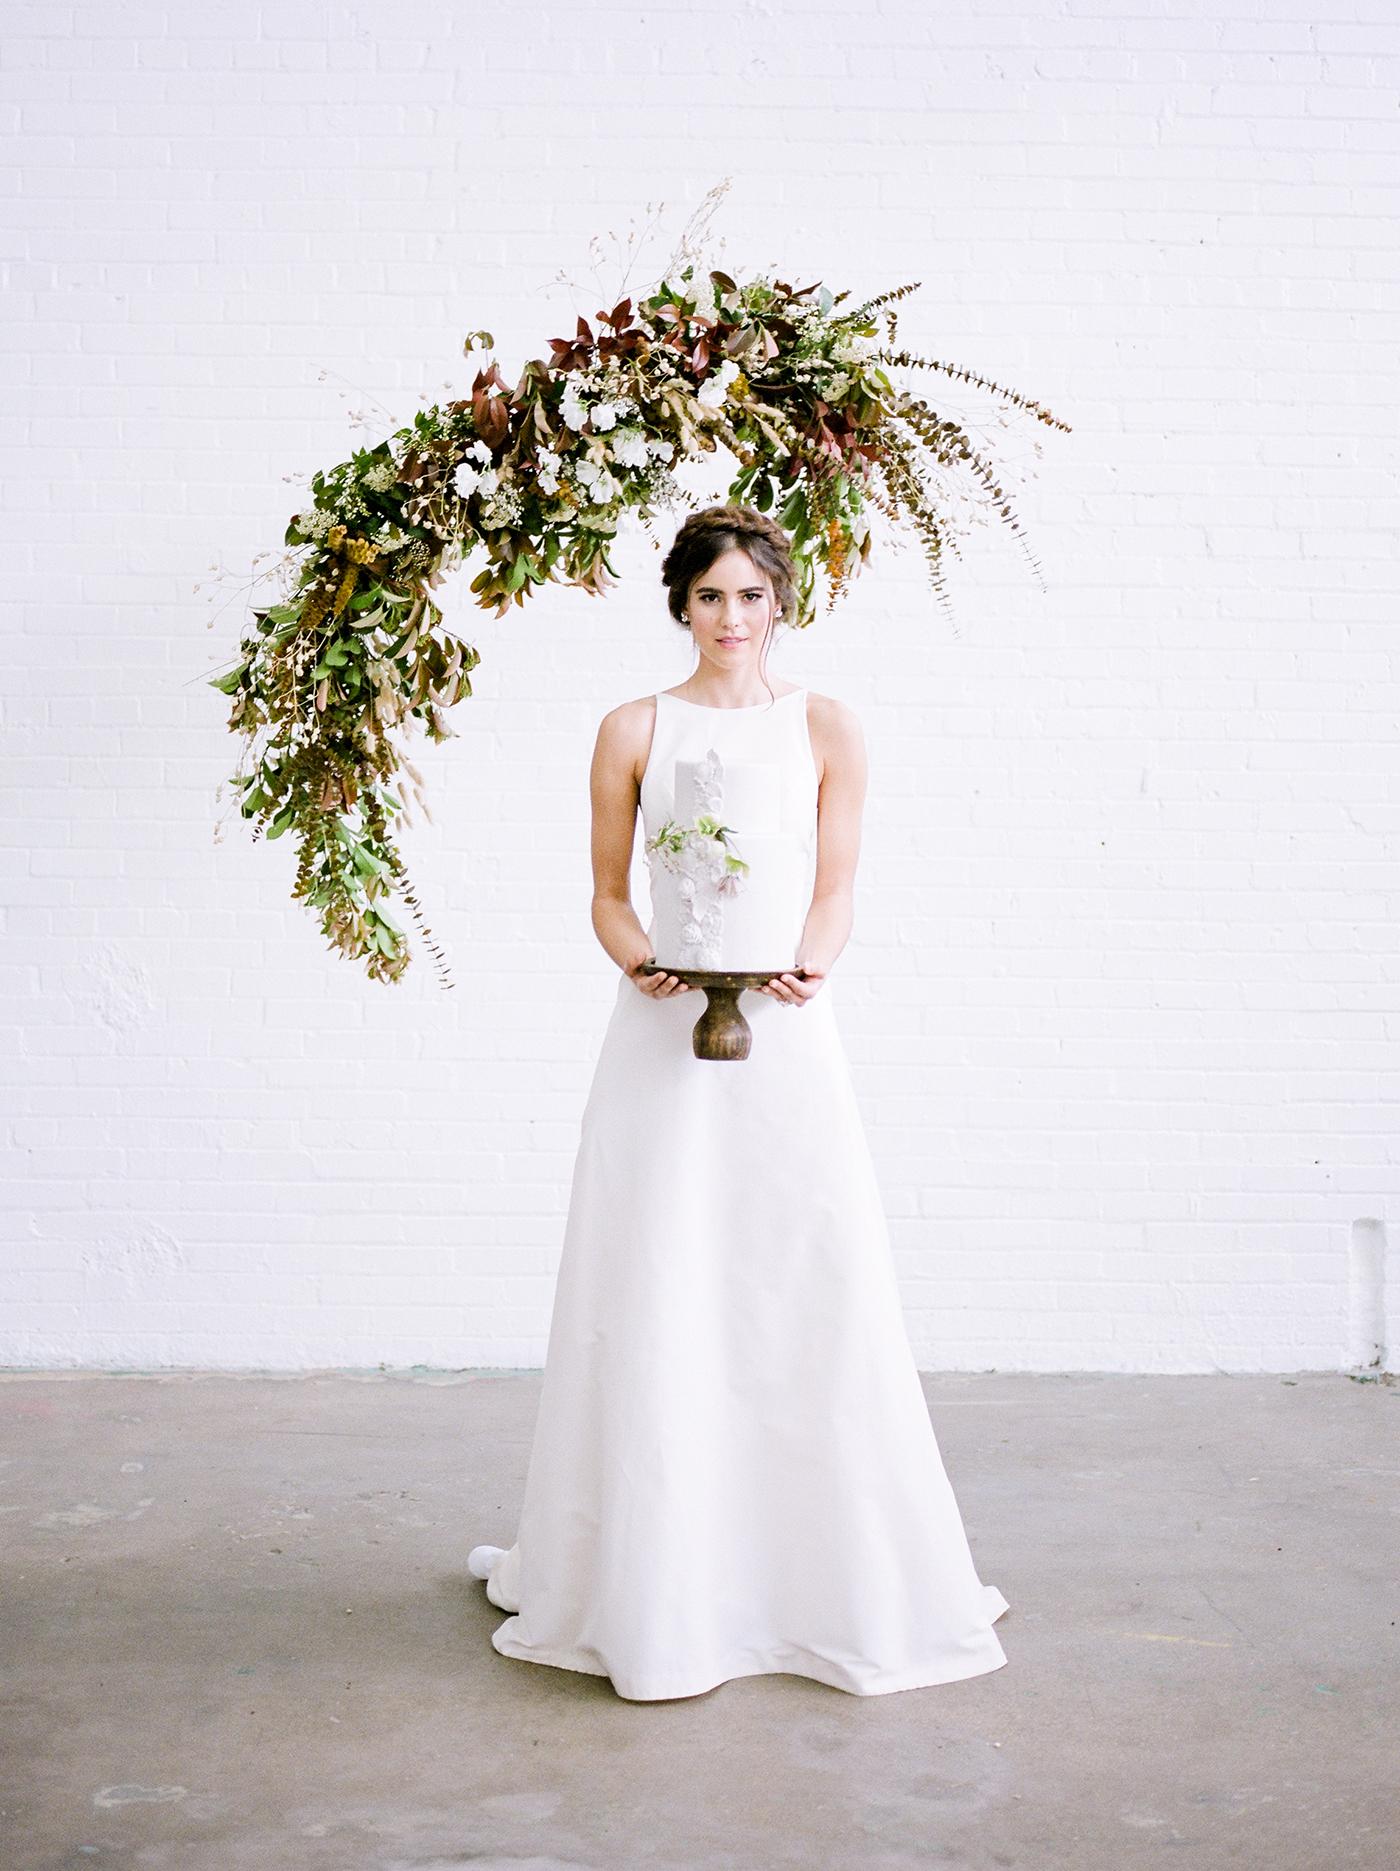 Wedding Floral Design Dallas - Olive Grove Design - Mimimalist Fall Wedding - 00091.jpg